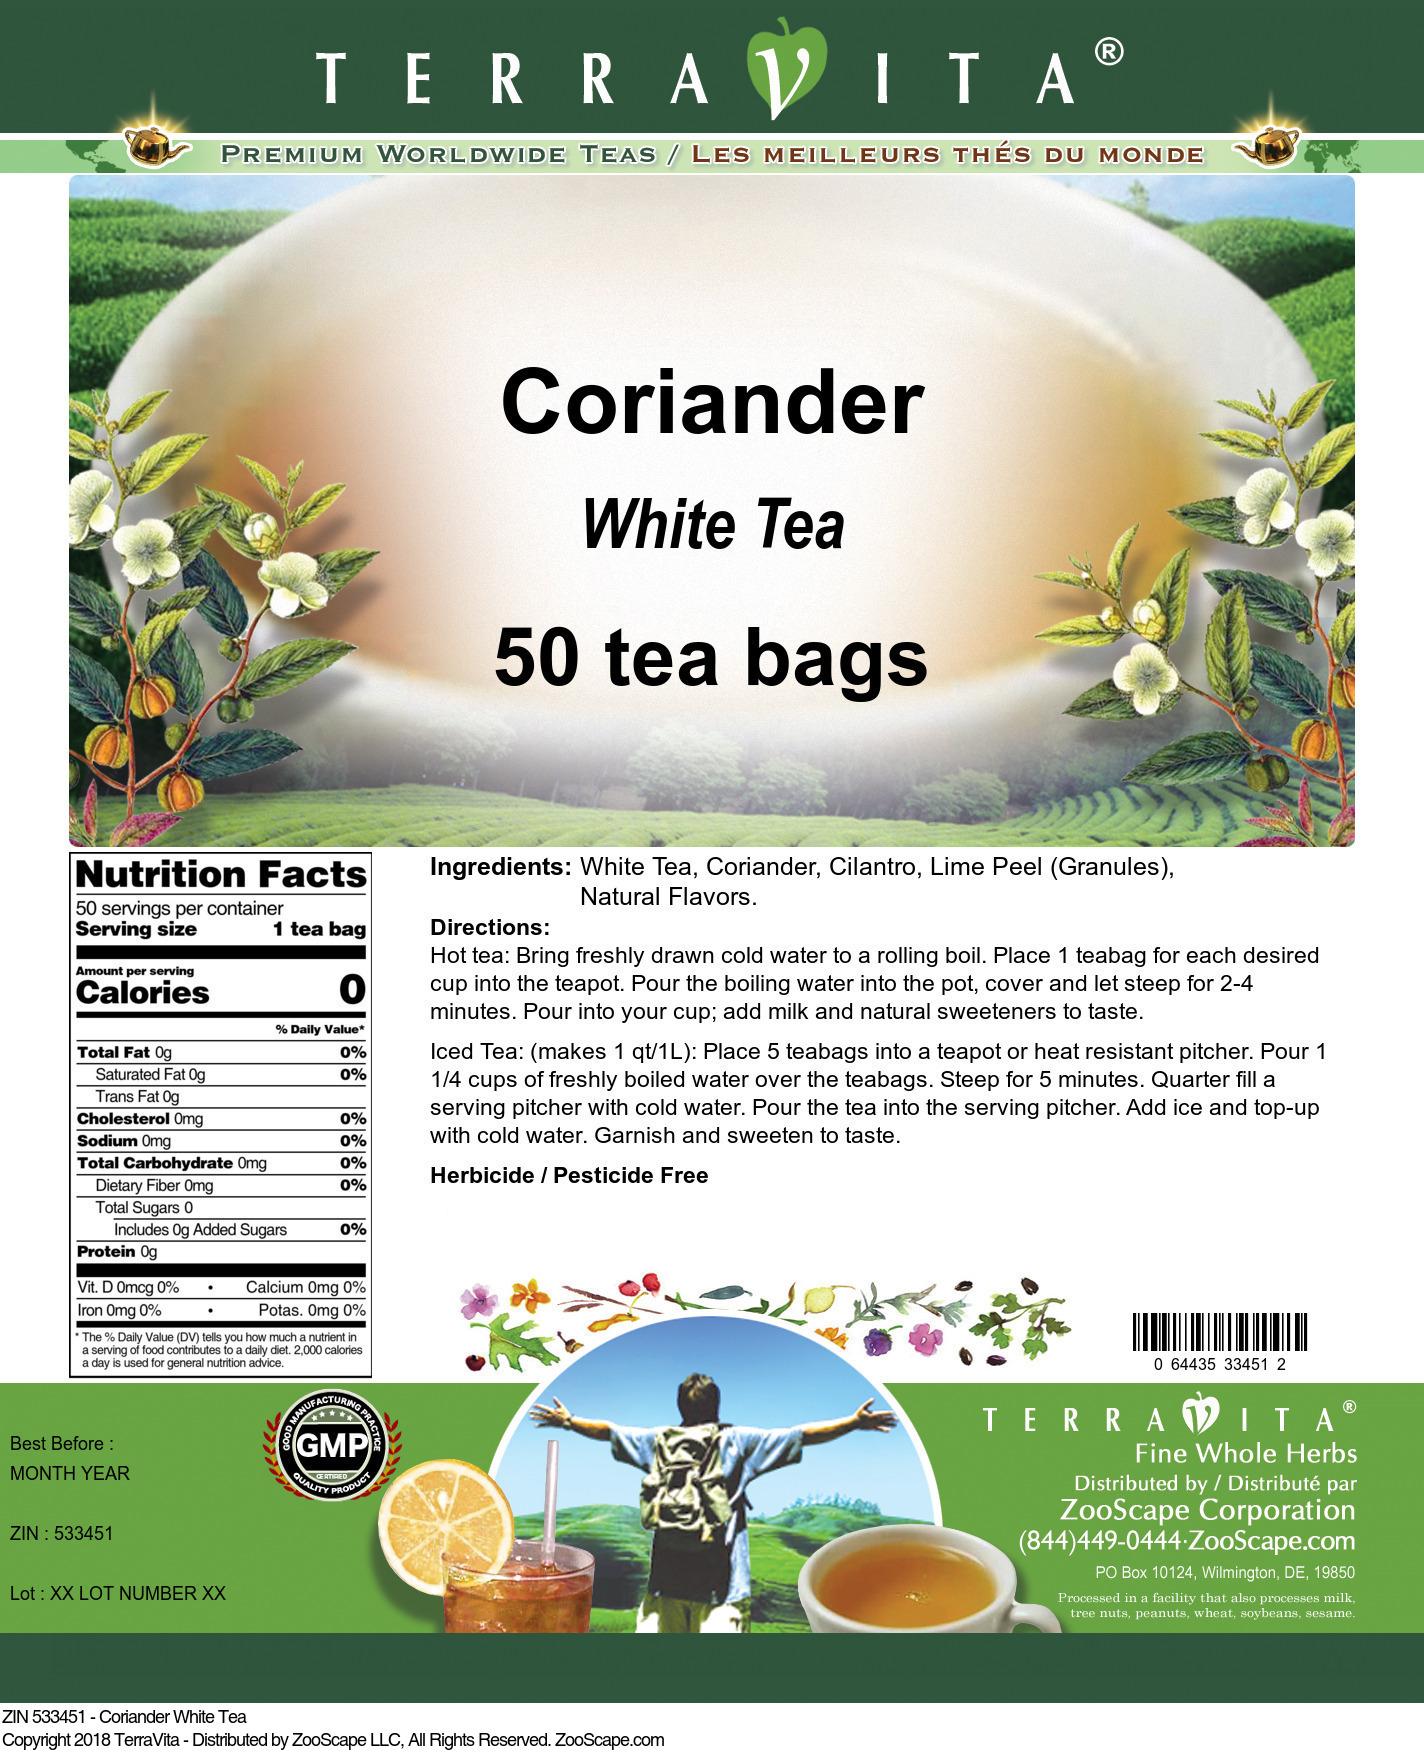 Coriander White Tea